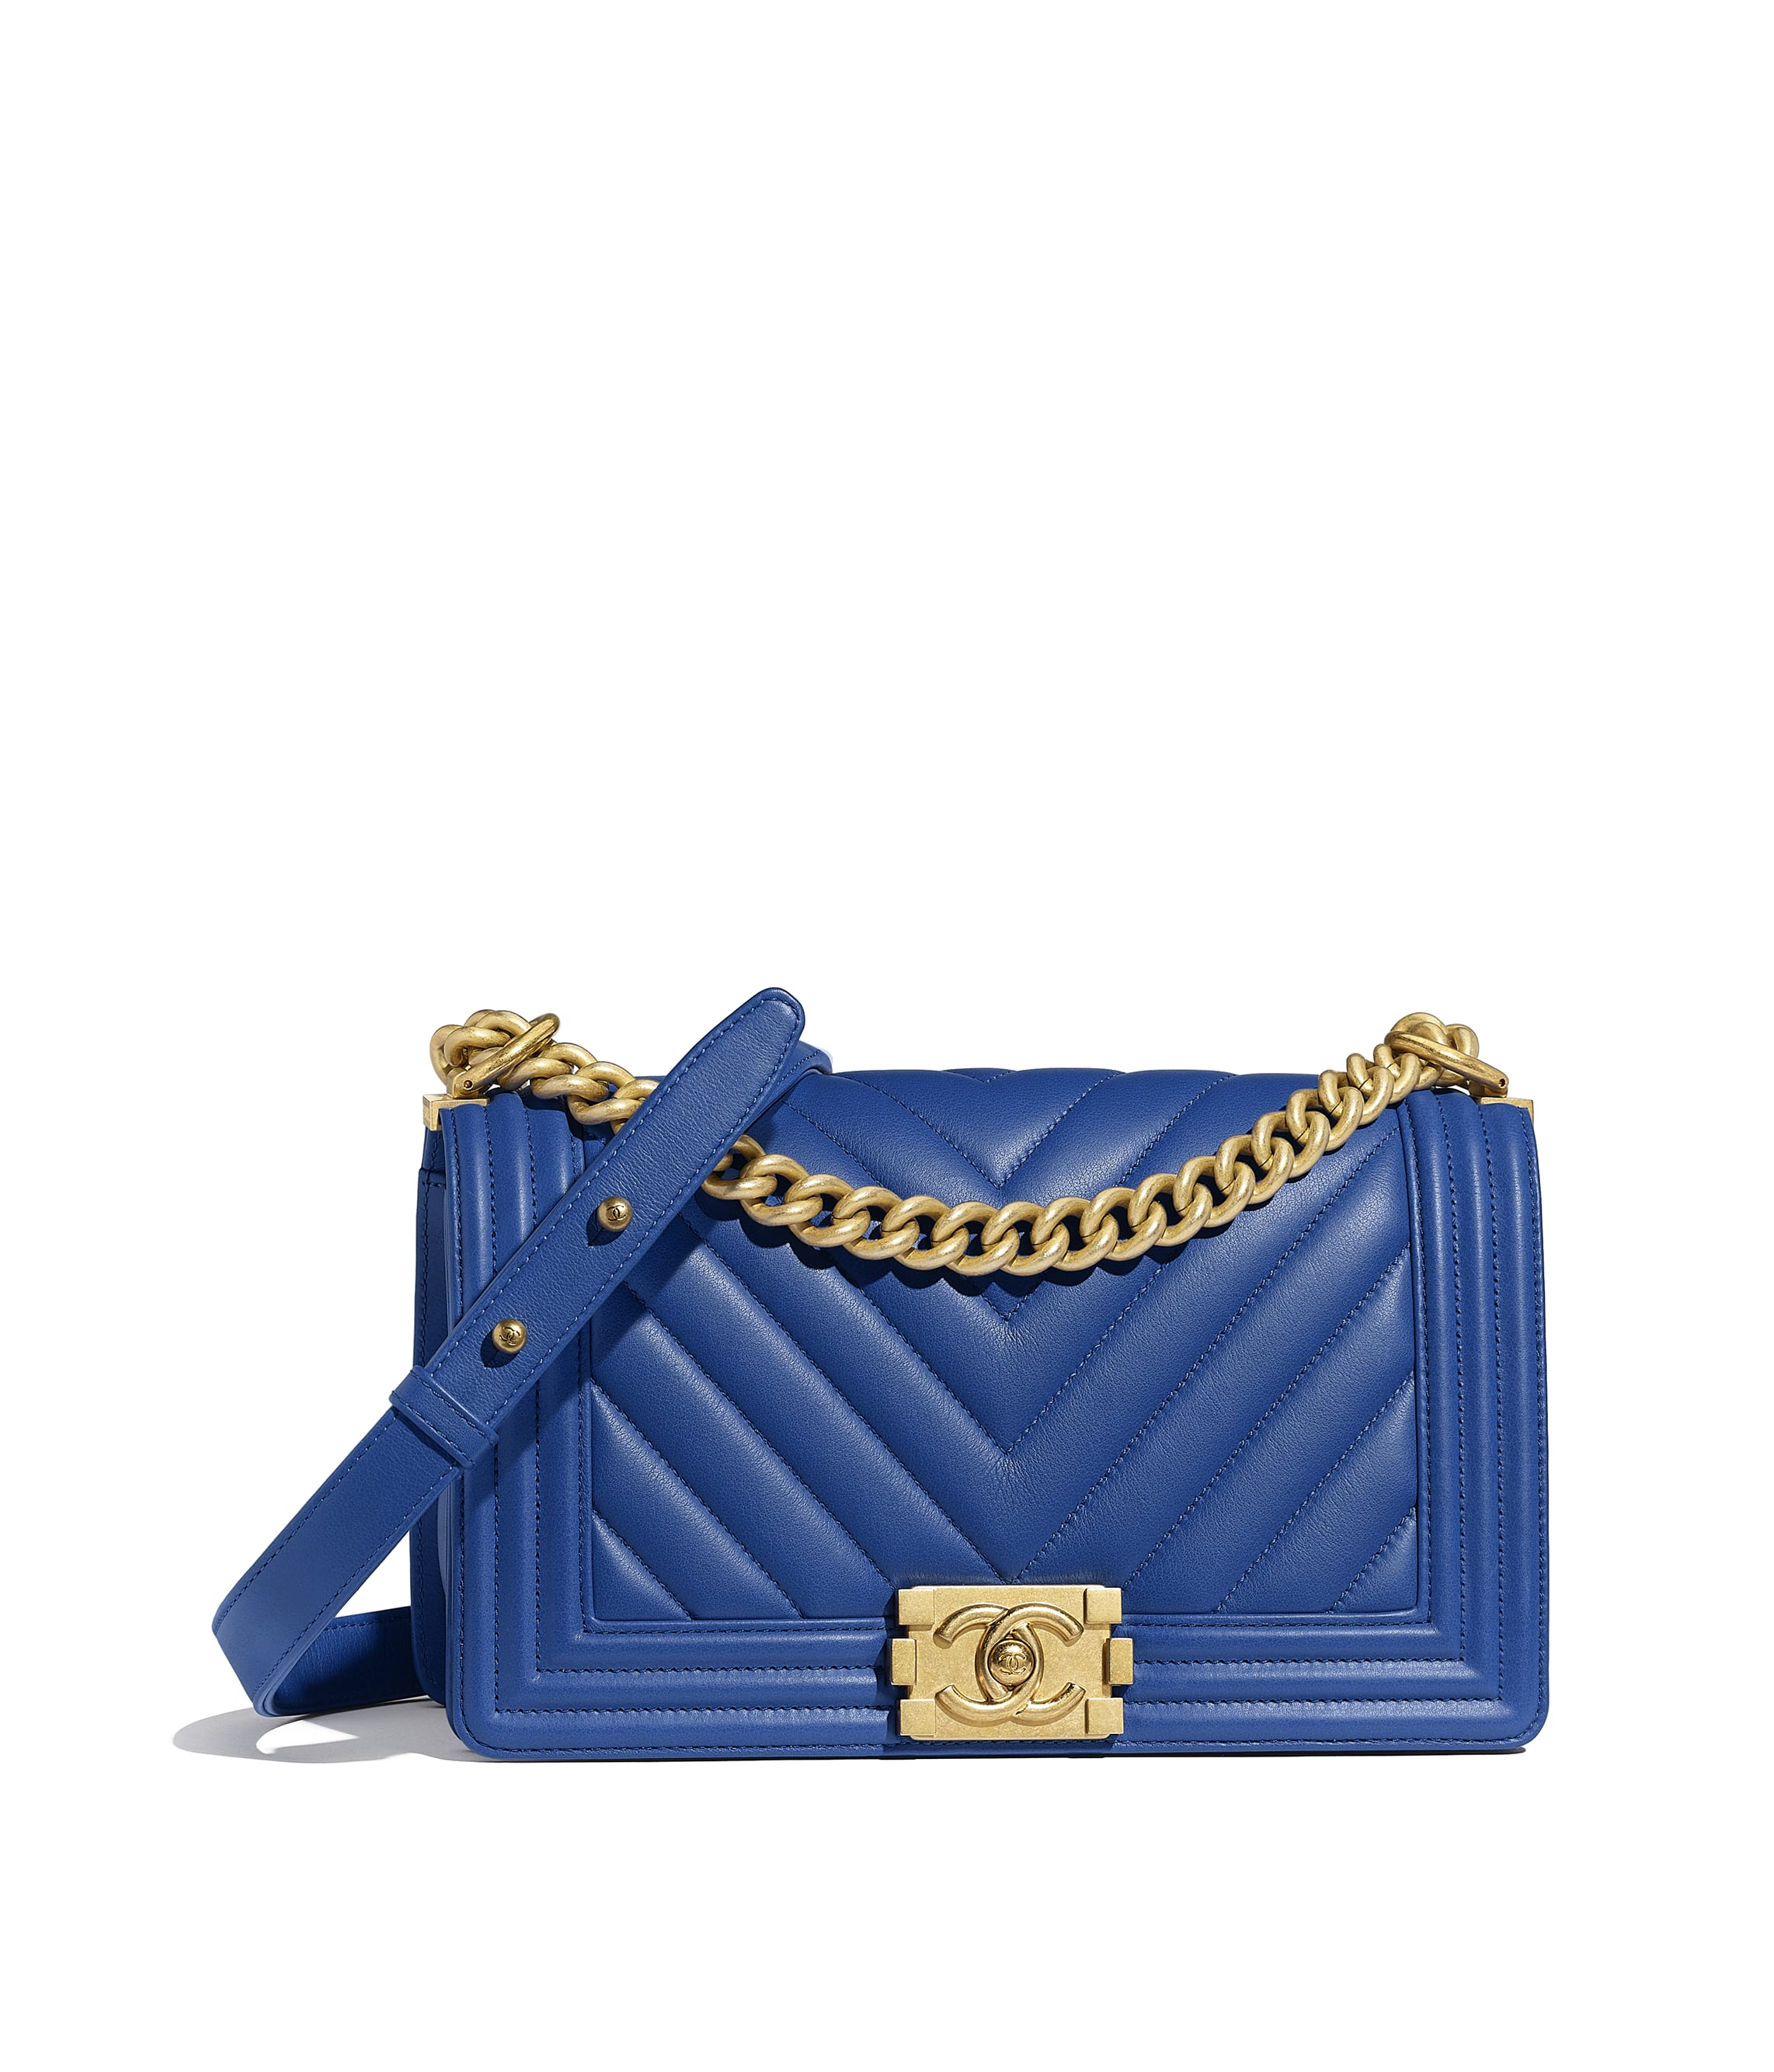 e67071dee28a BOY CHANEL - Handbags - CHANEL